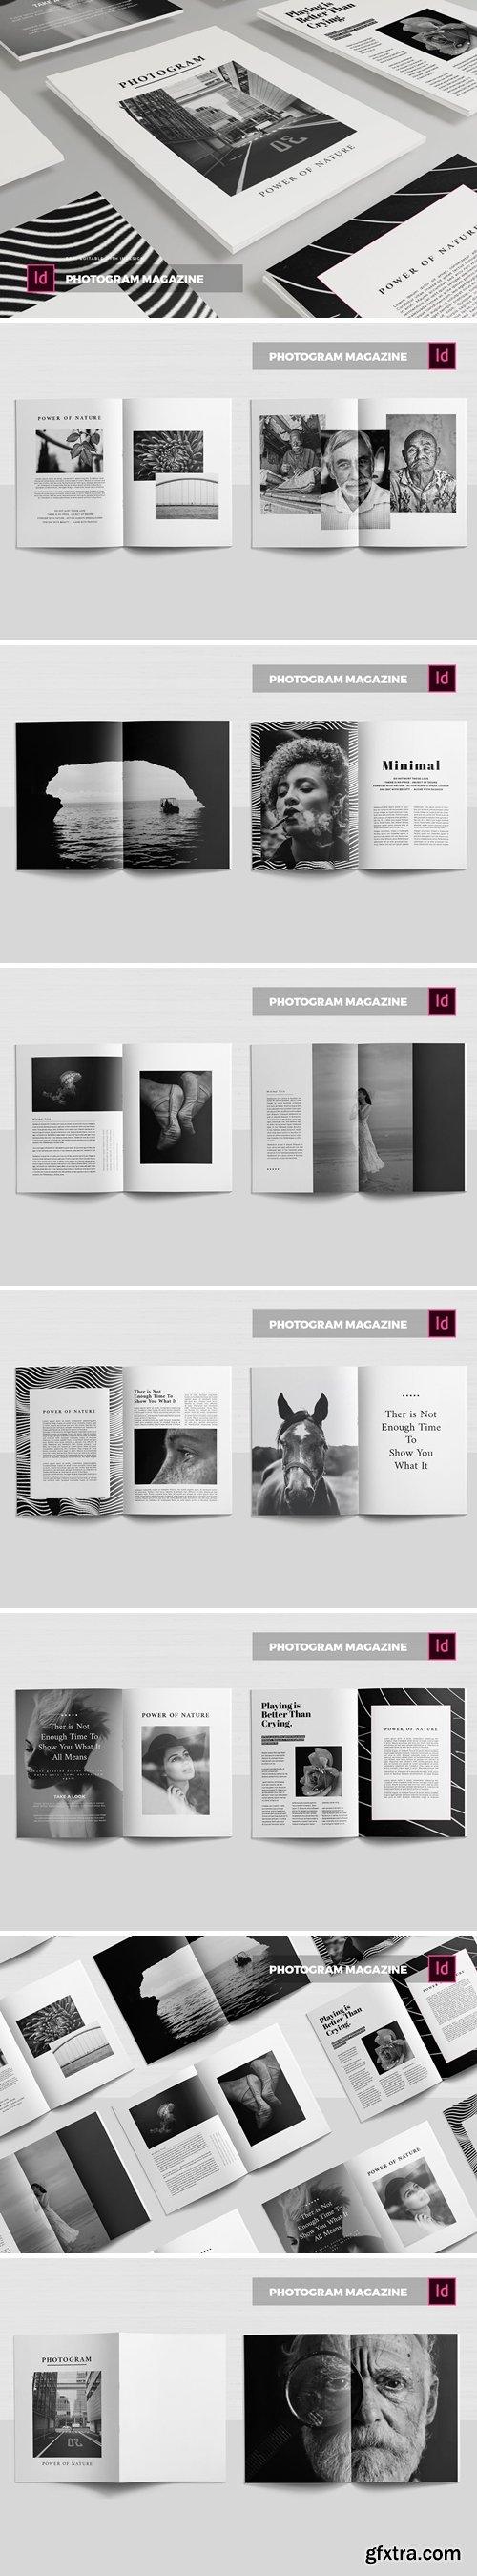 Photogram | Magazine